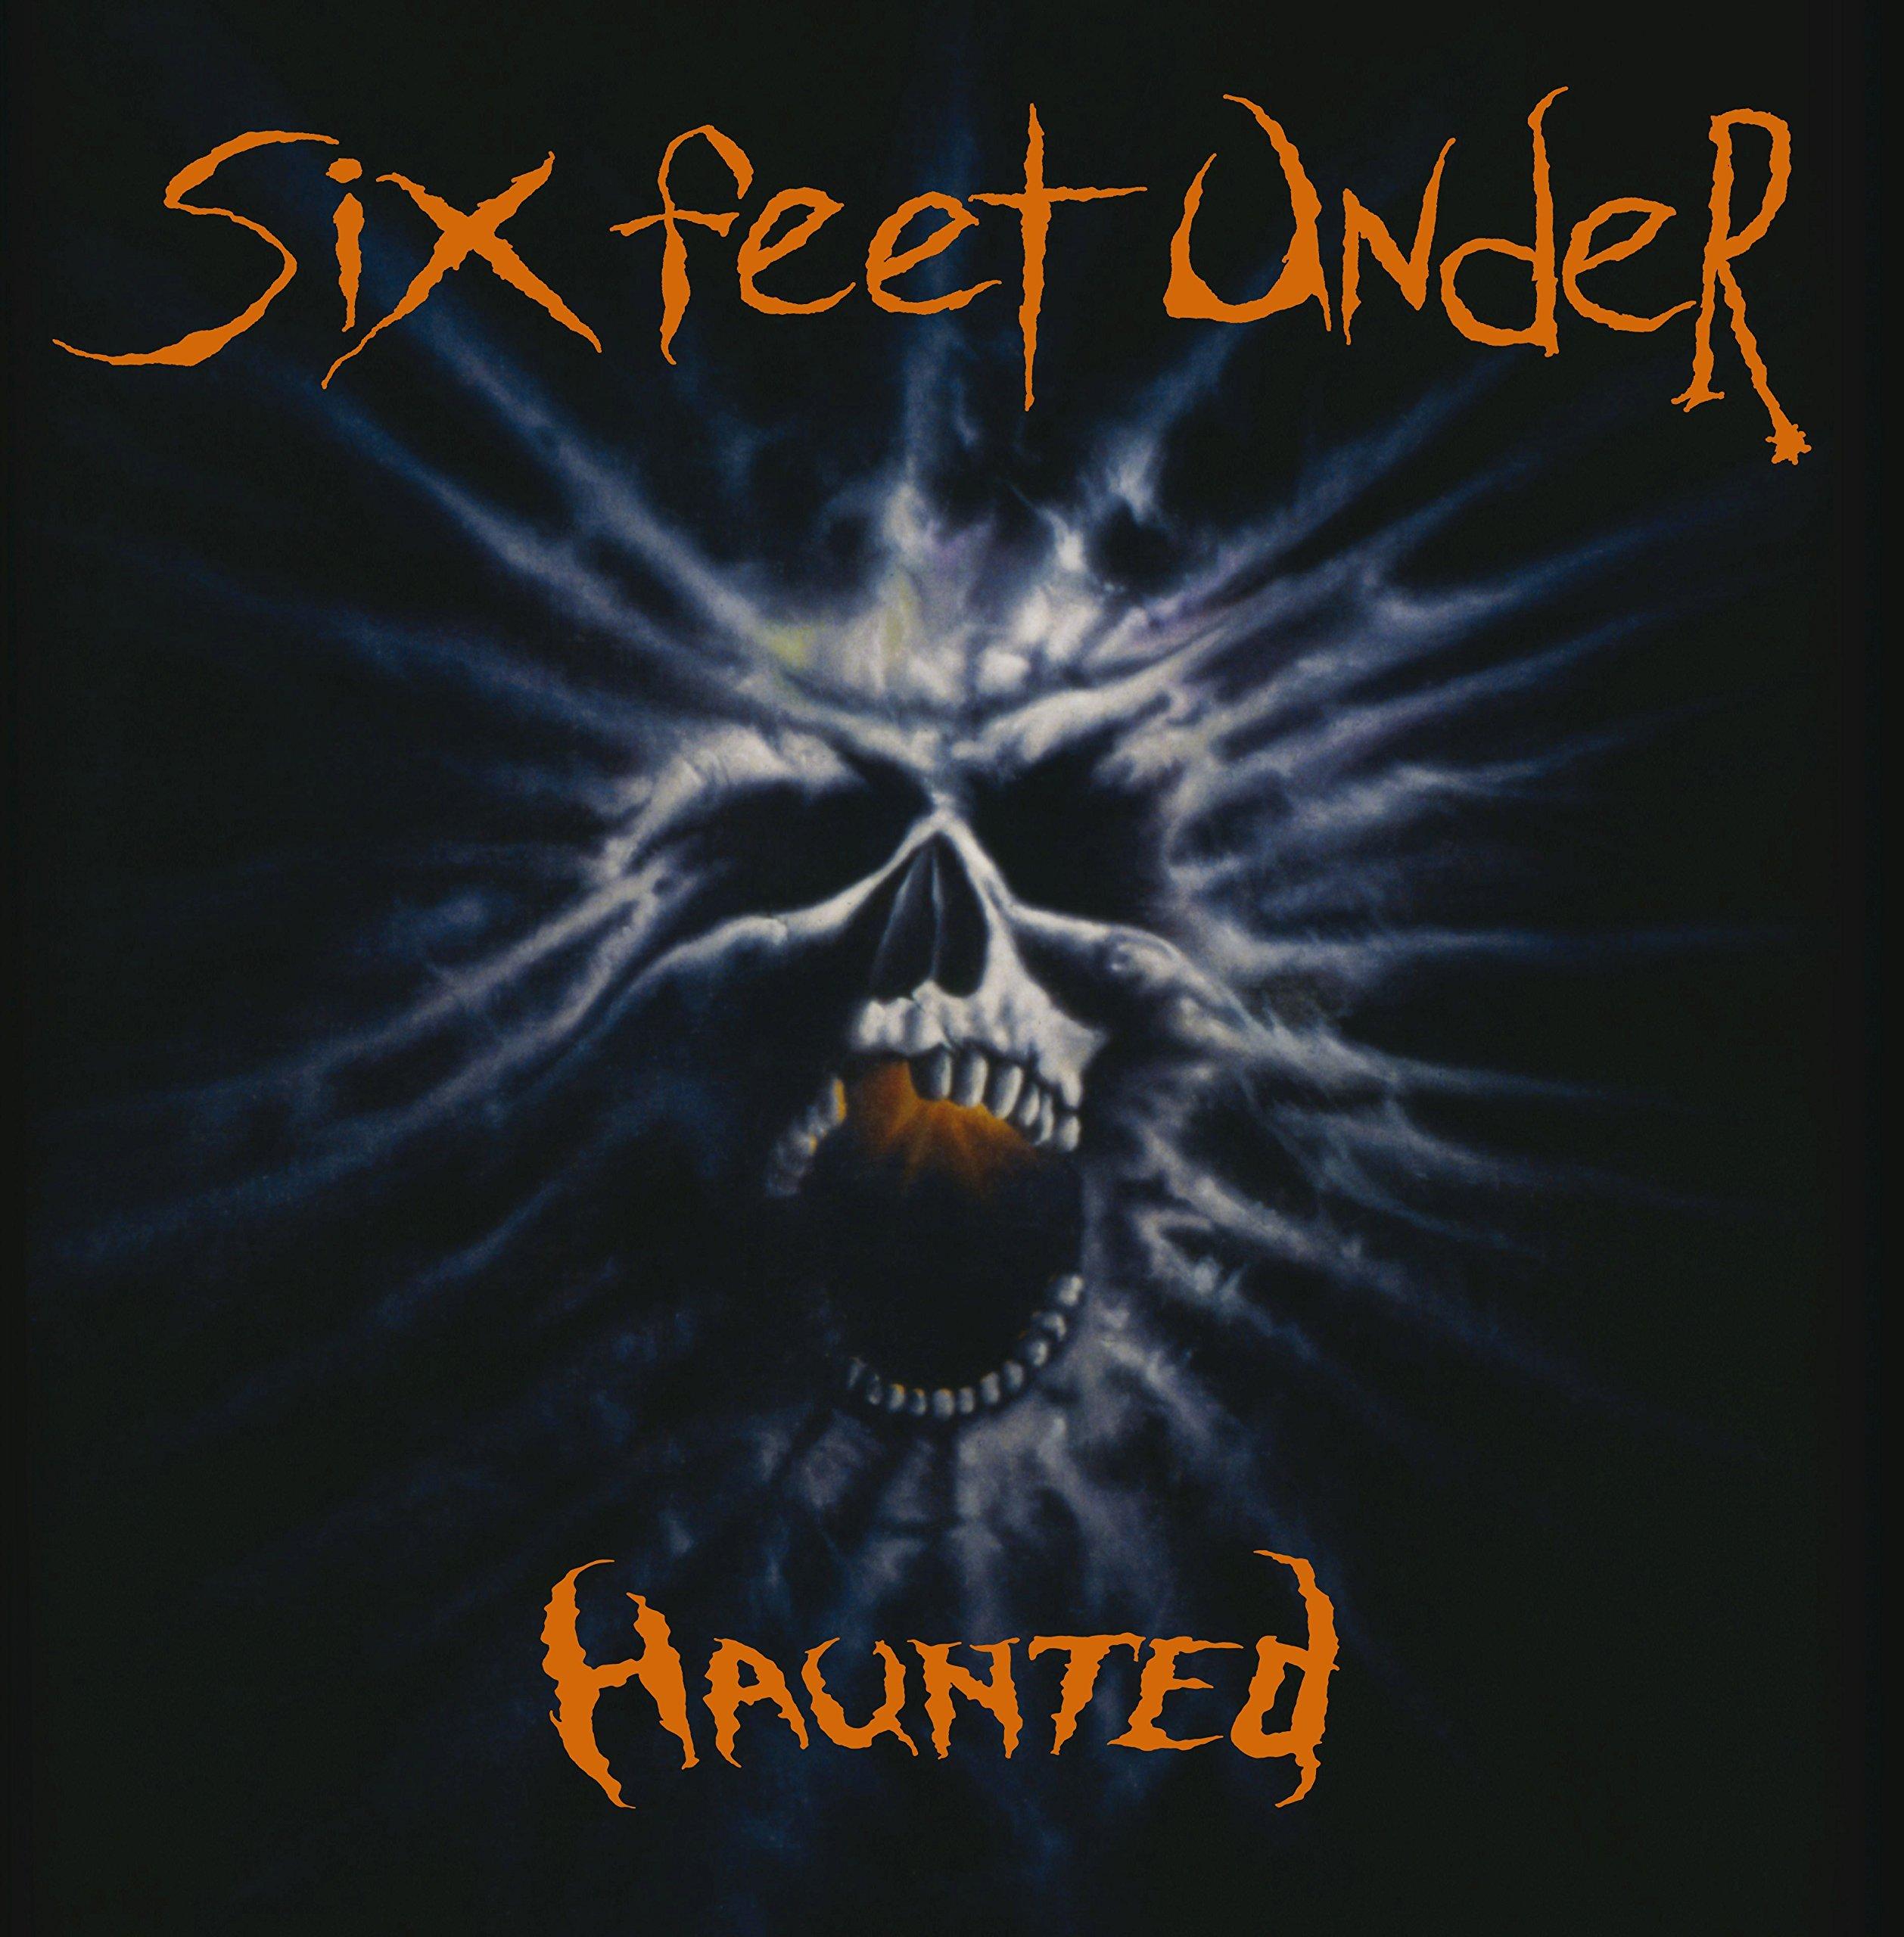 Vinilo : Six Feet Under - Haunted (LP Vinyl)